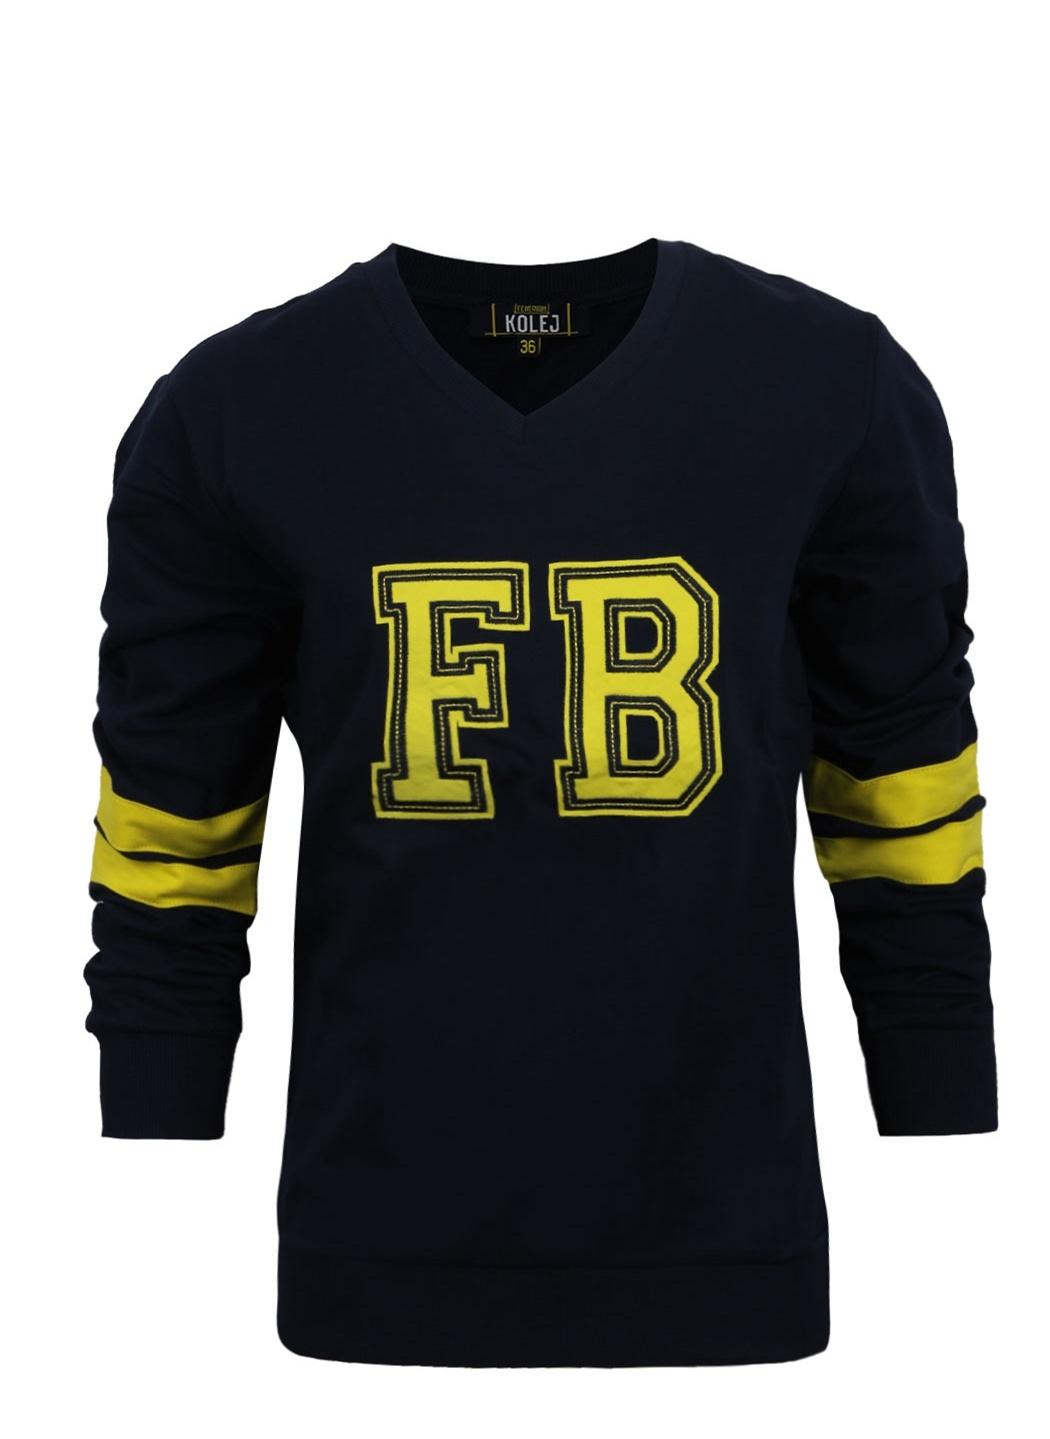 Fenerium Sweatshirt TK017B9Y07 Kadin Kolej Fb Sweat